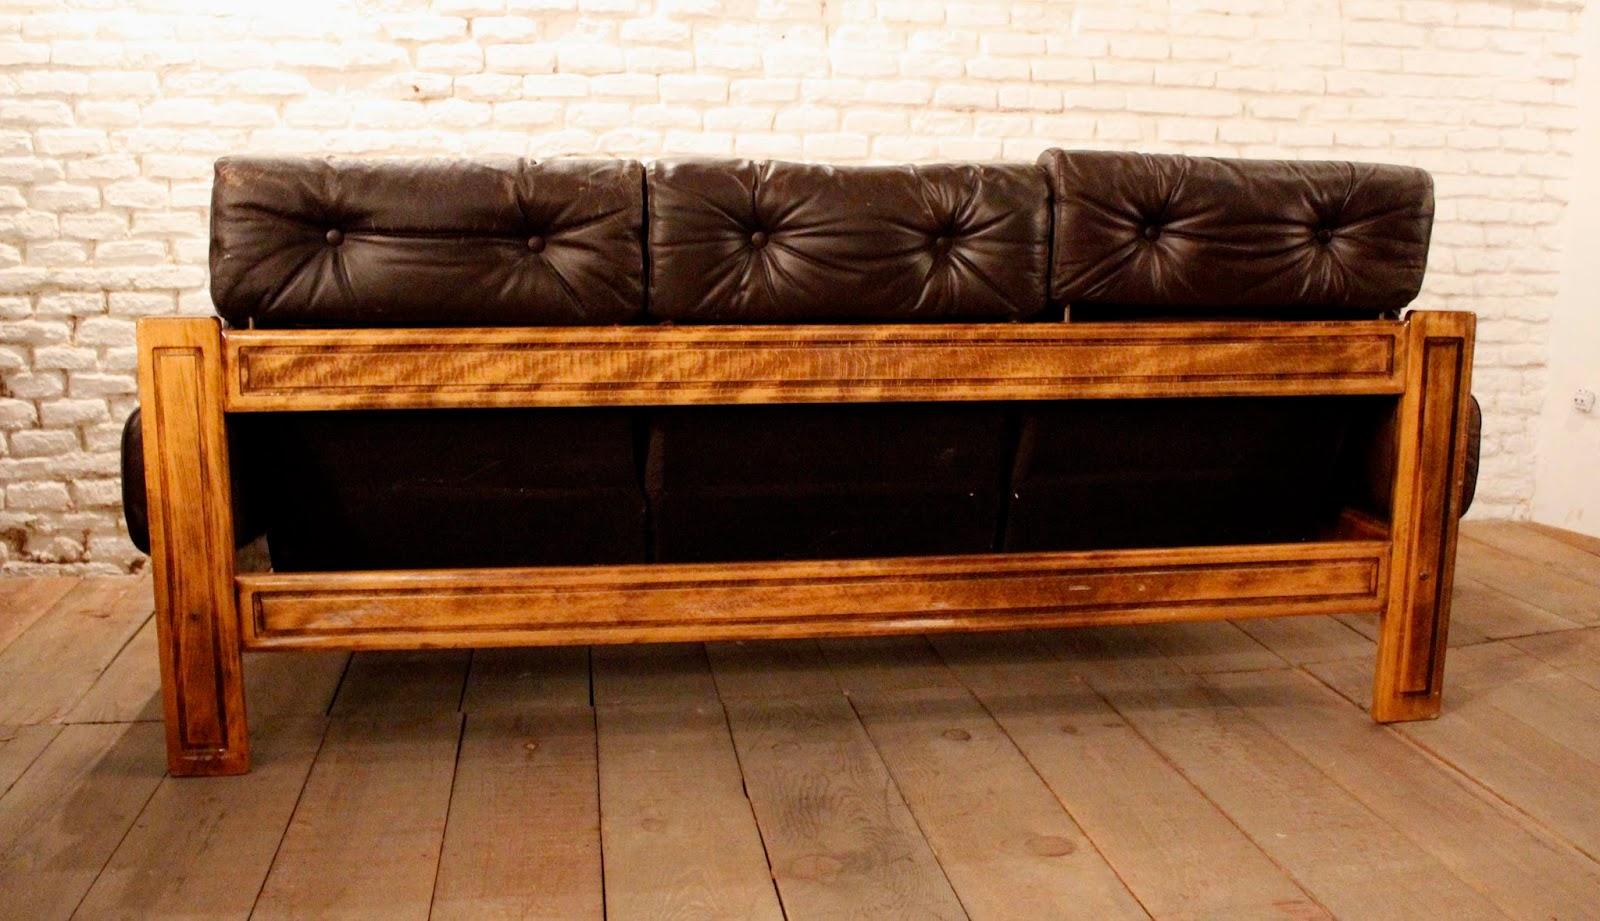 Tiendas de muebles online madrid finest litera con mesa for Muebles orientales madrid